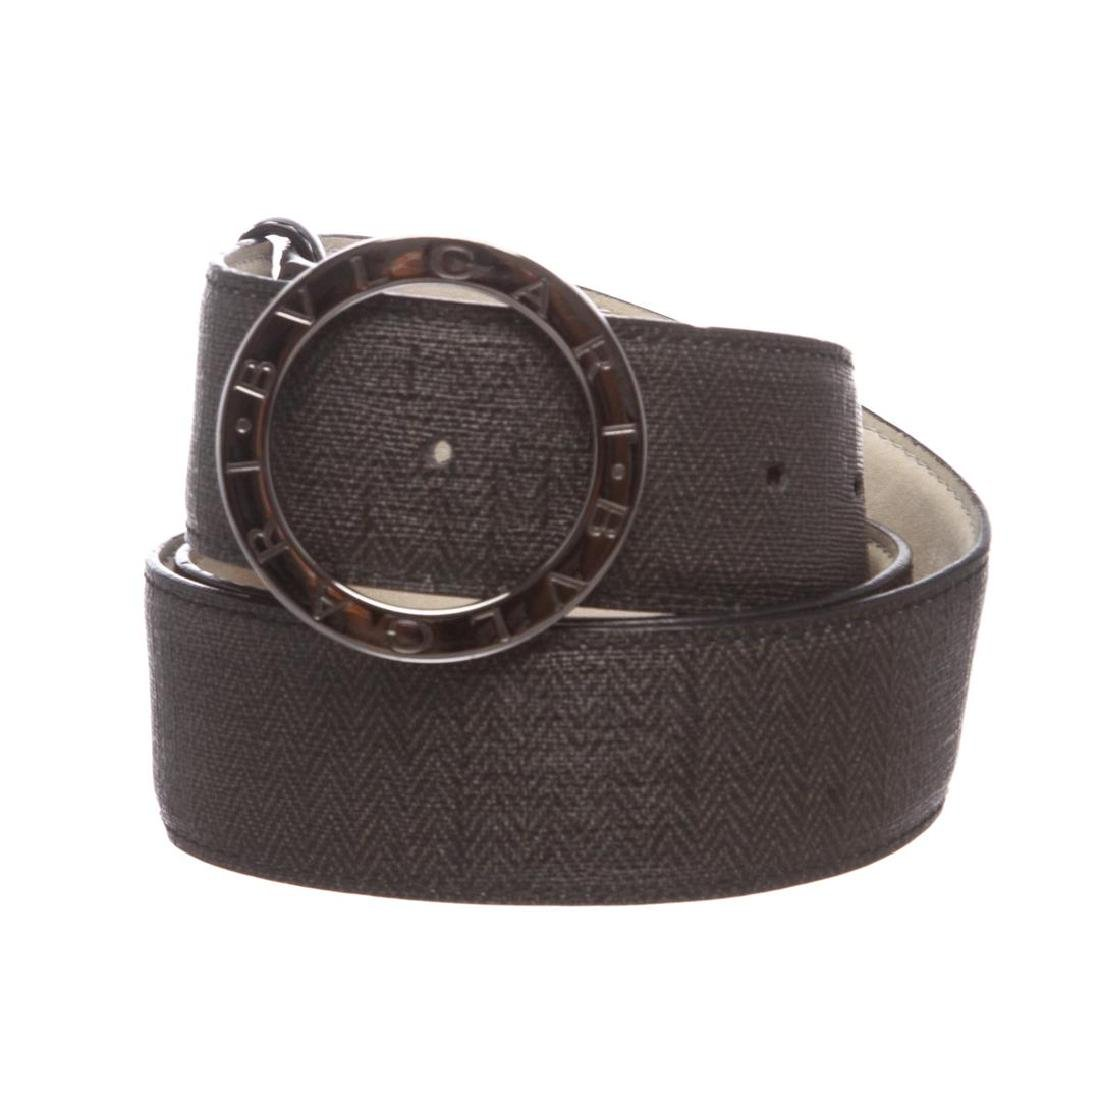 Bvlgari Black Gray Coated Canvas Leather Belt